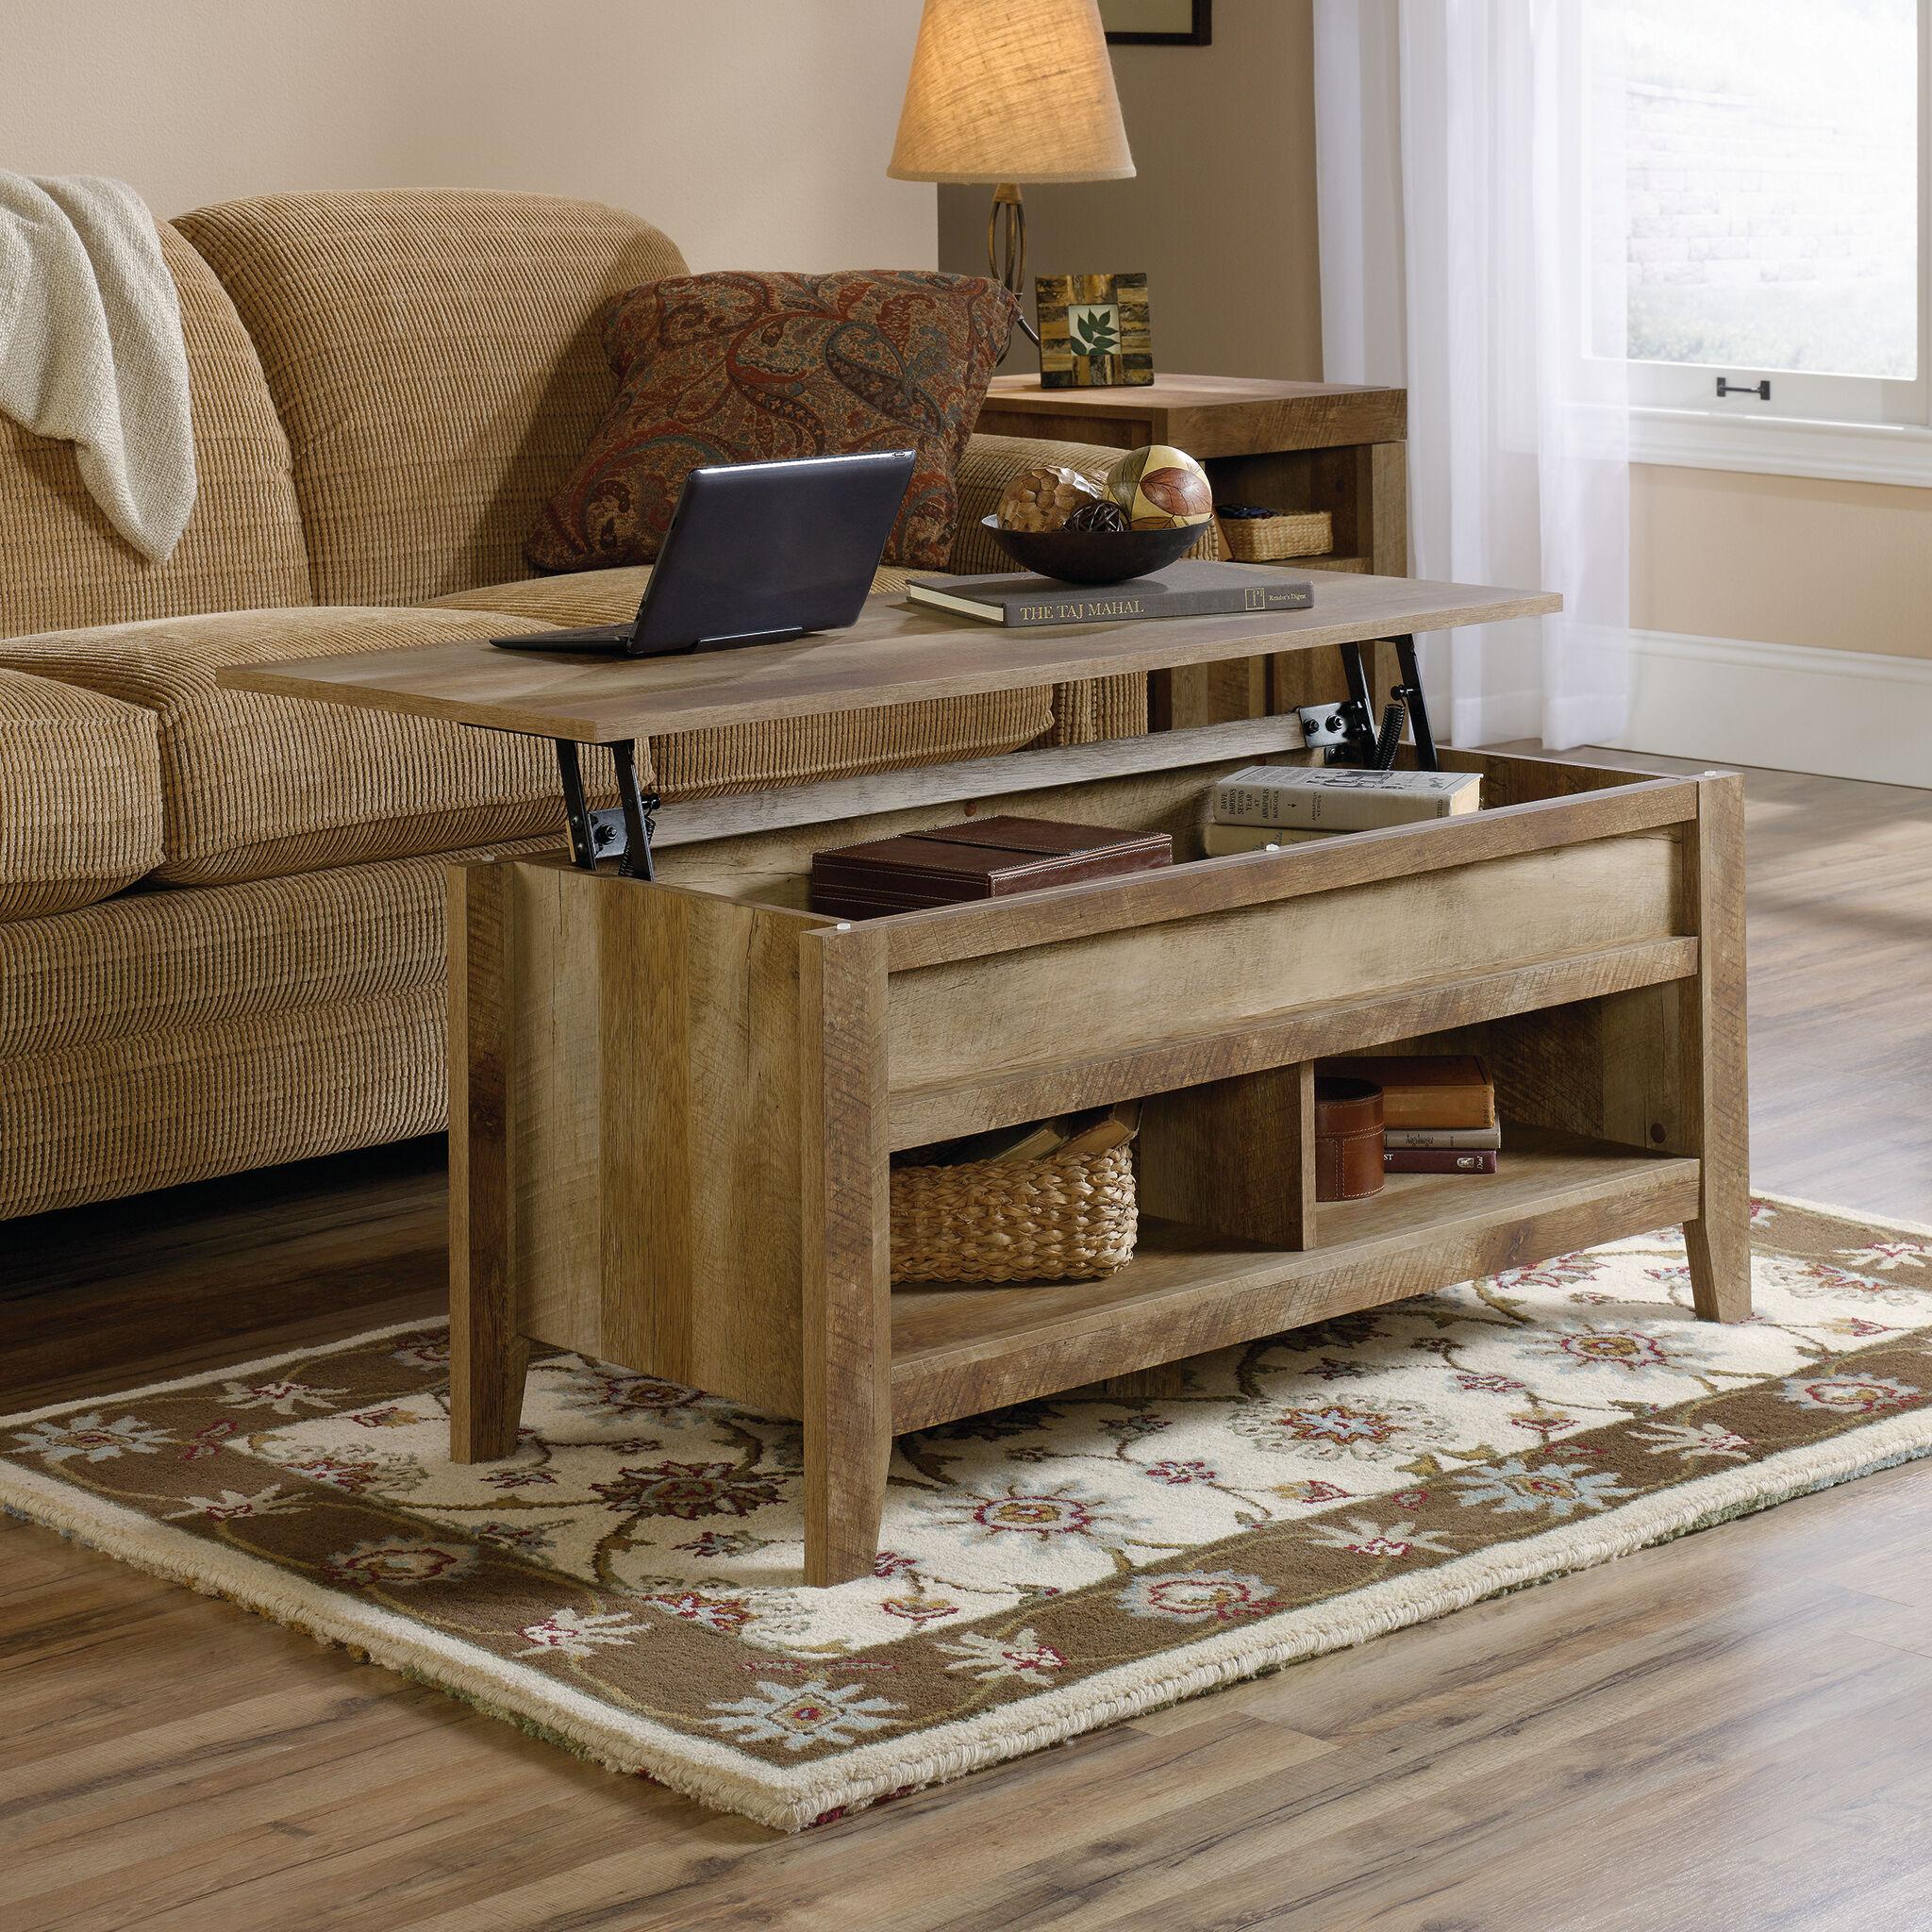 Rectangular Lift Top Contemporary Coffee Tableu0026nbsp;in Craftsman Oak